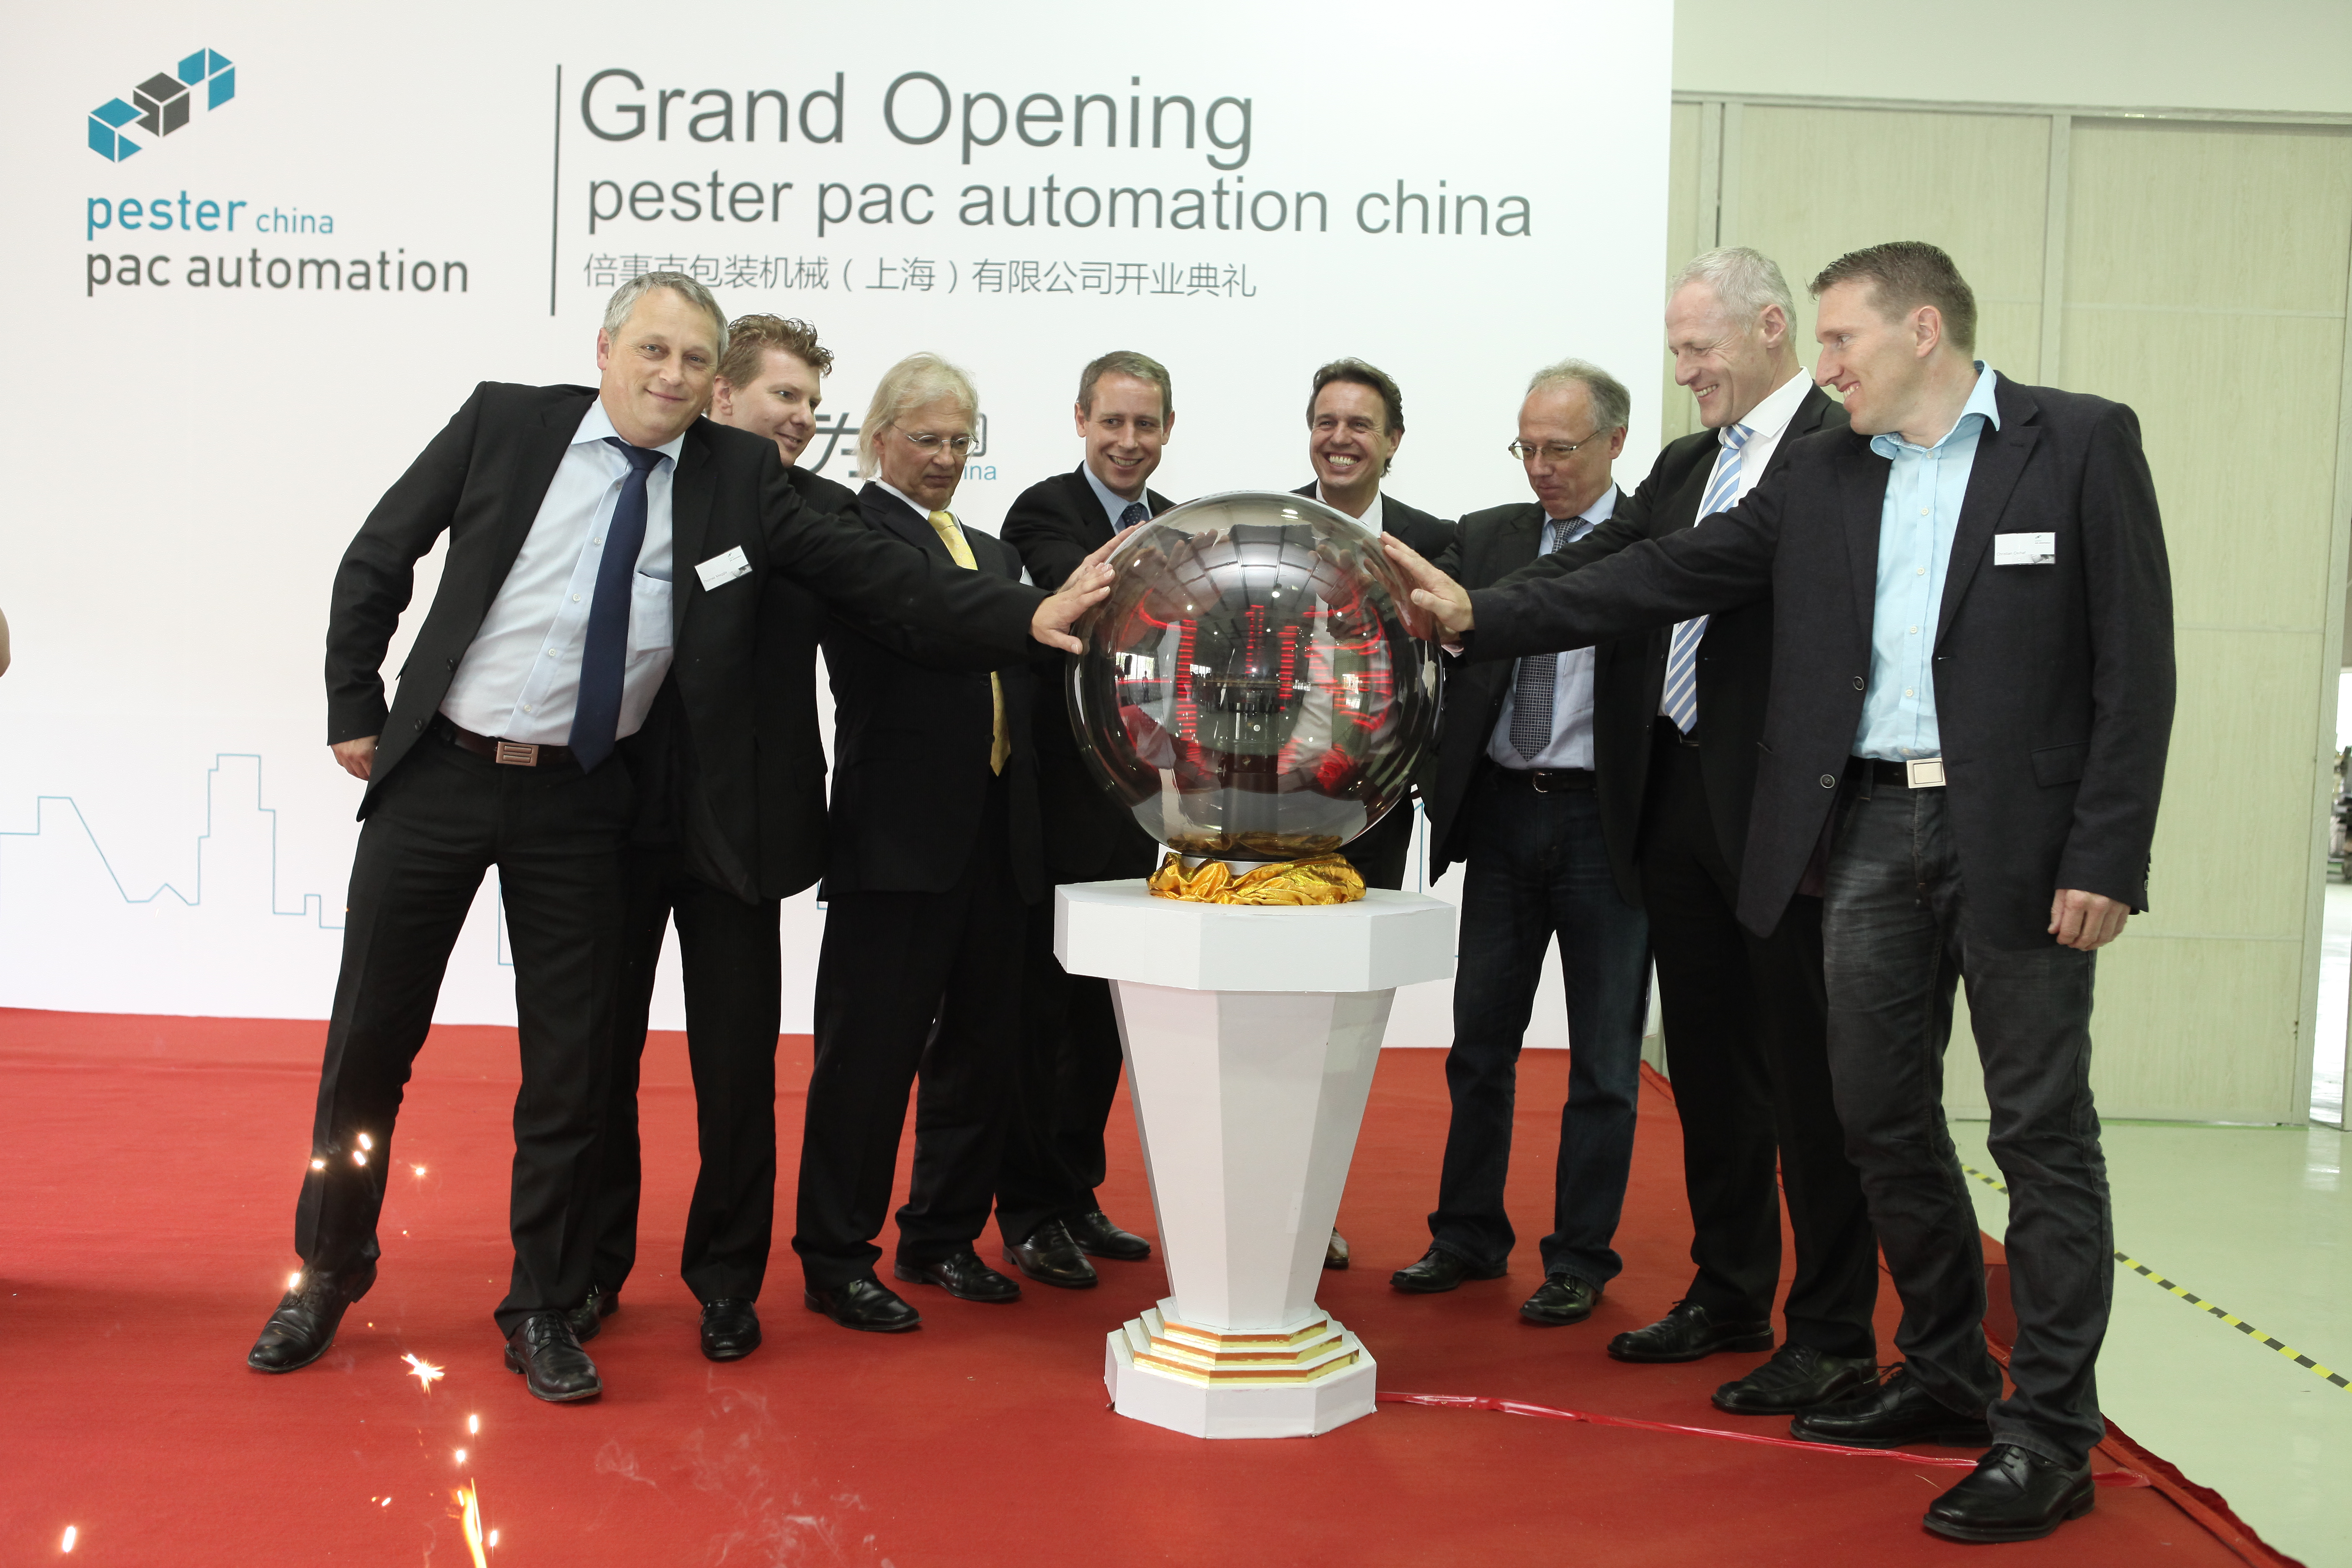 Pester建立中国工厂力推包装自动化